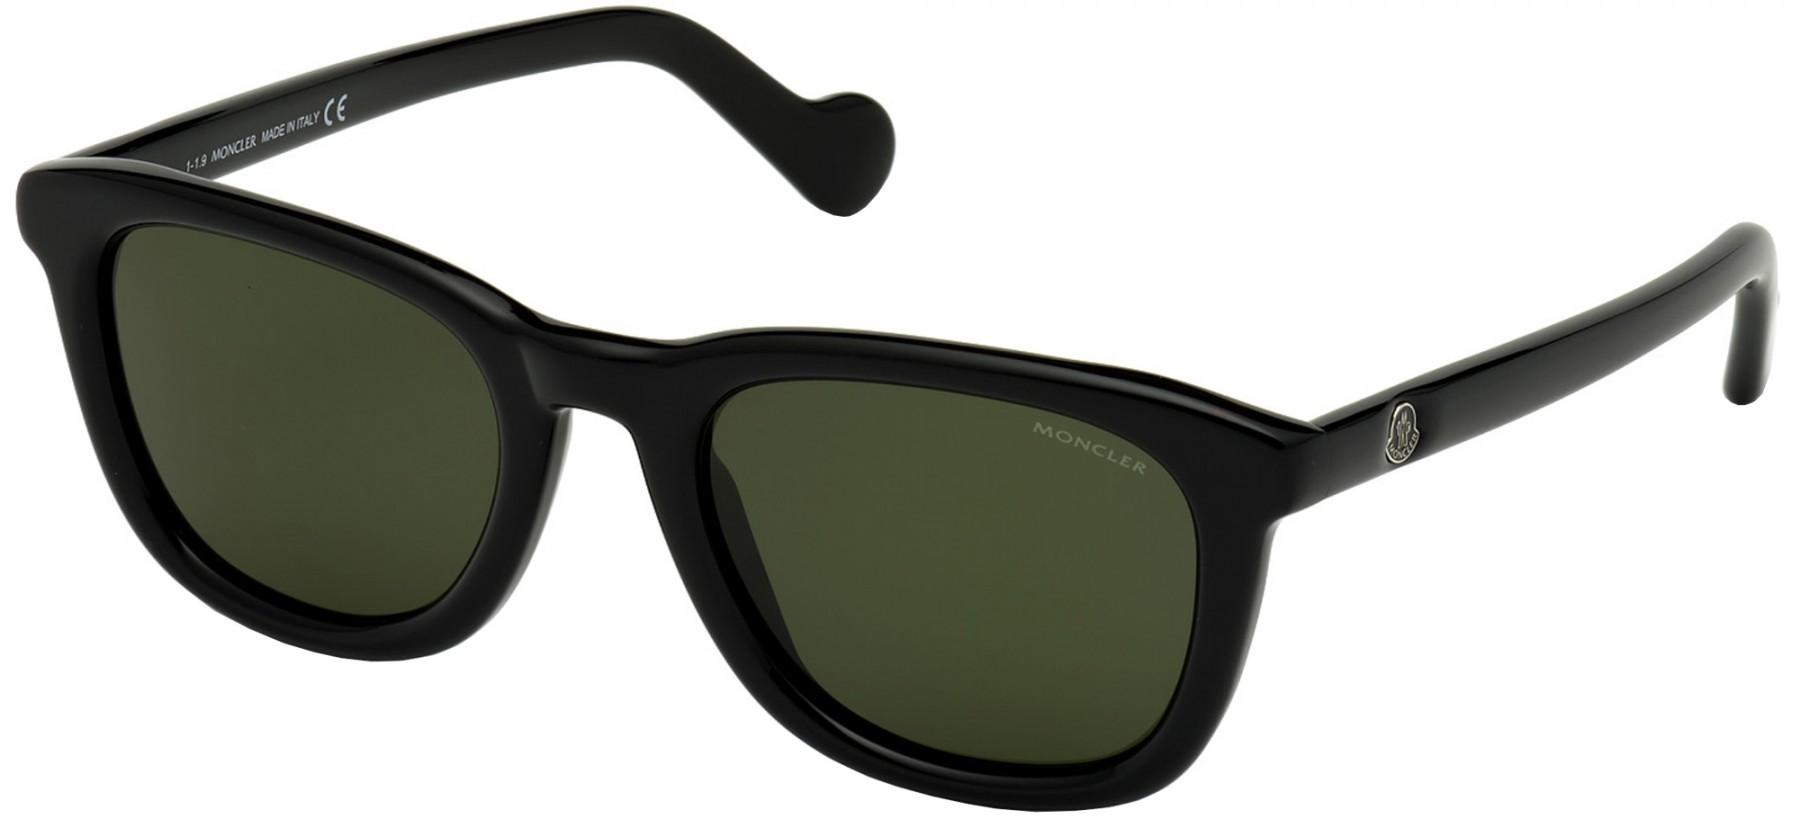 Moncler 0118 01R - Oculos de Sol